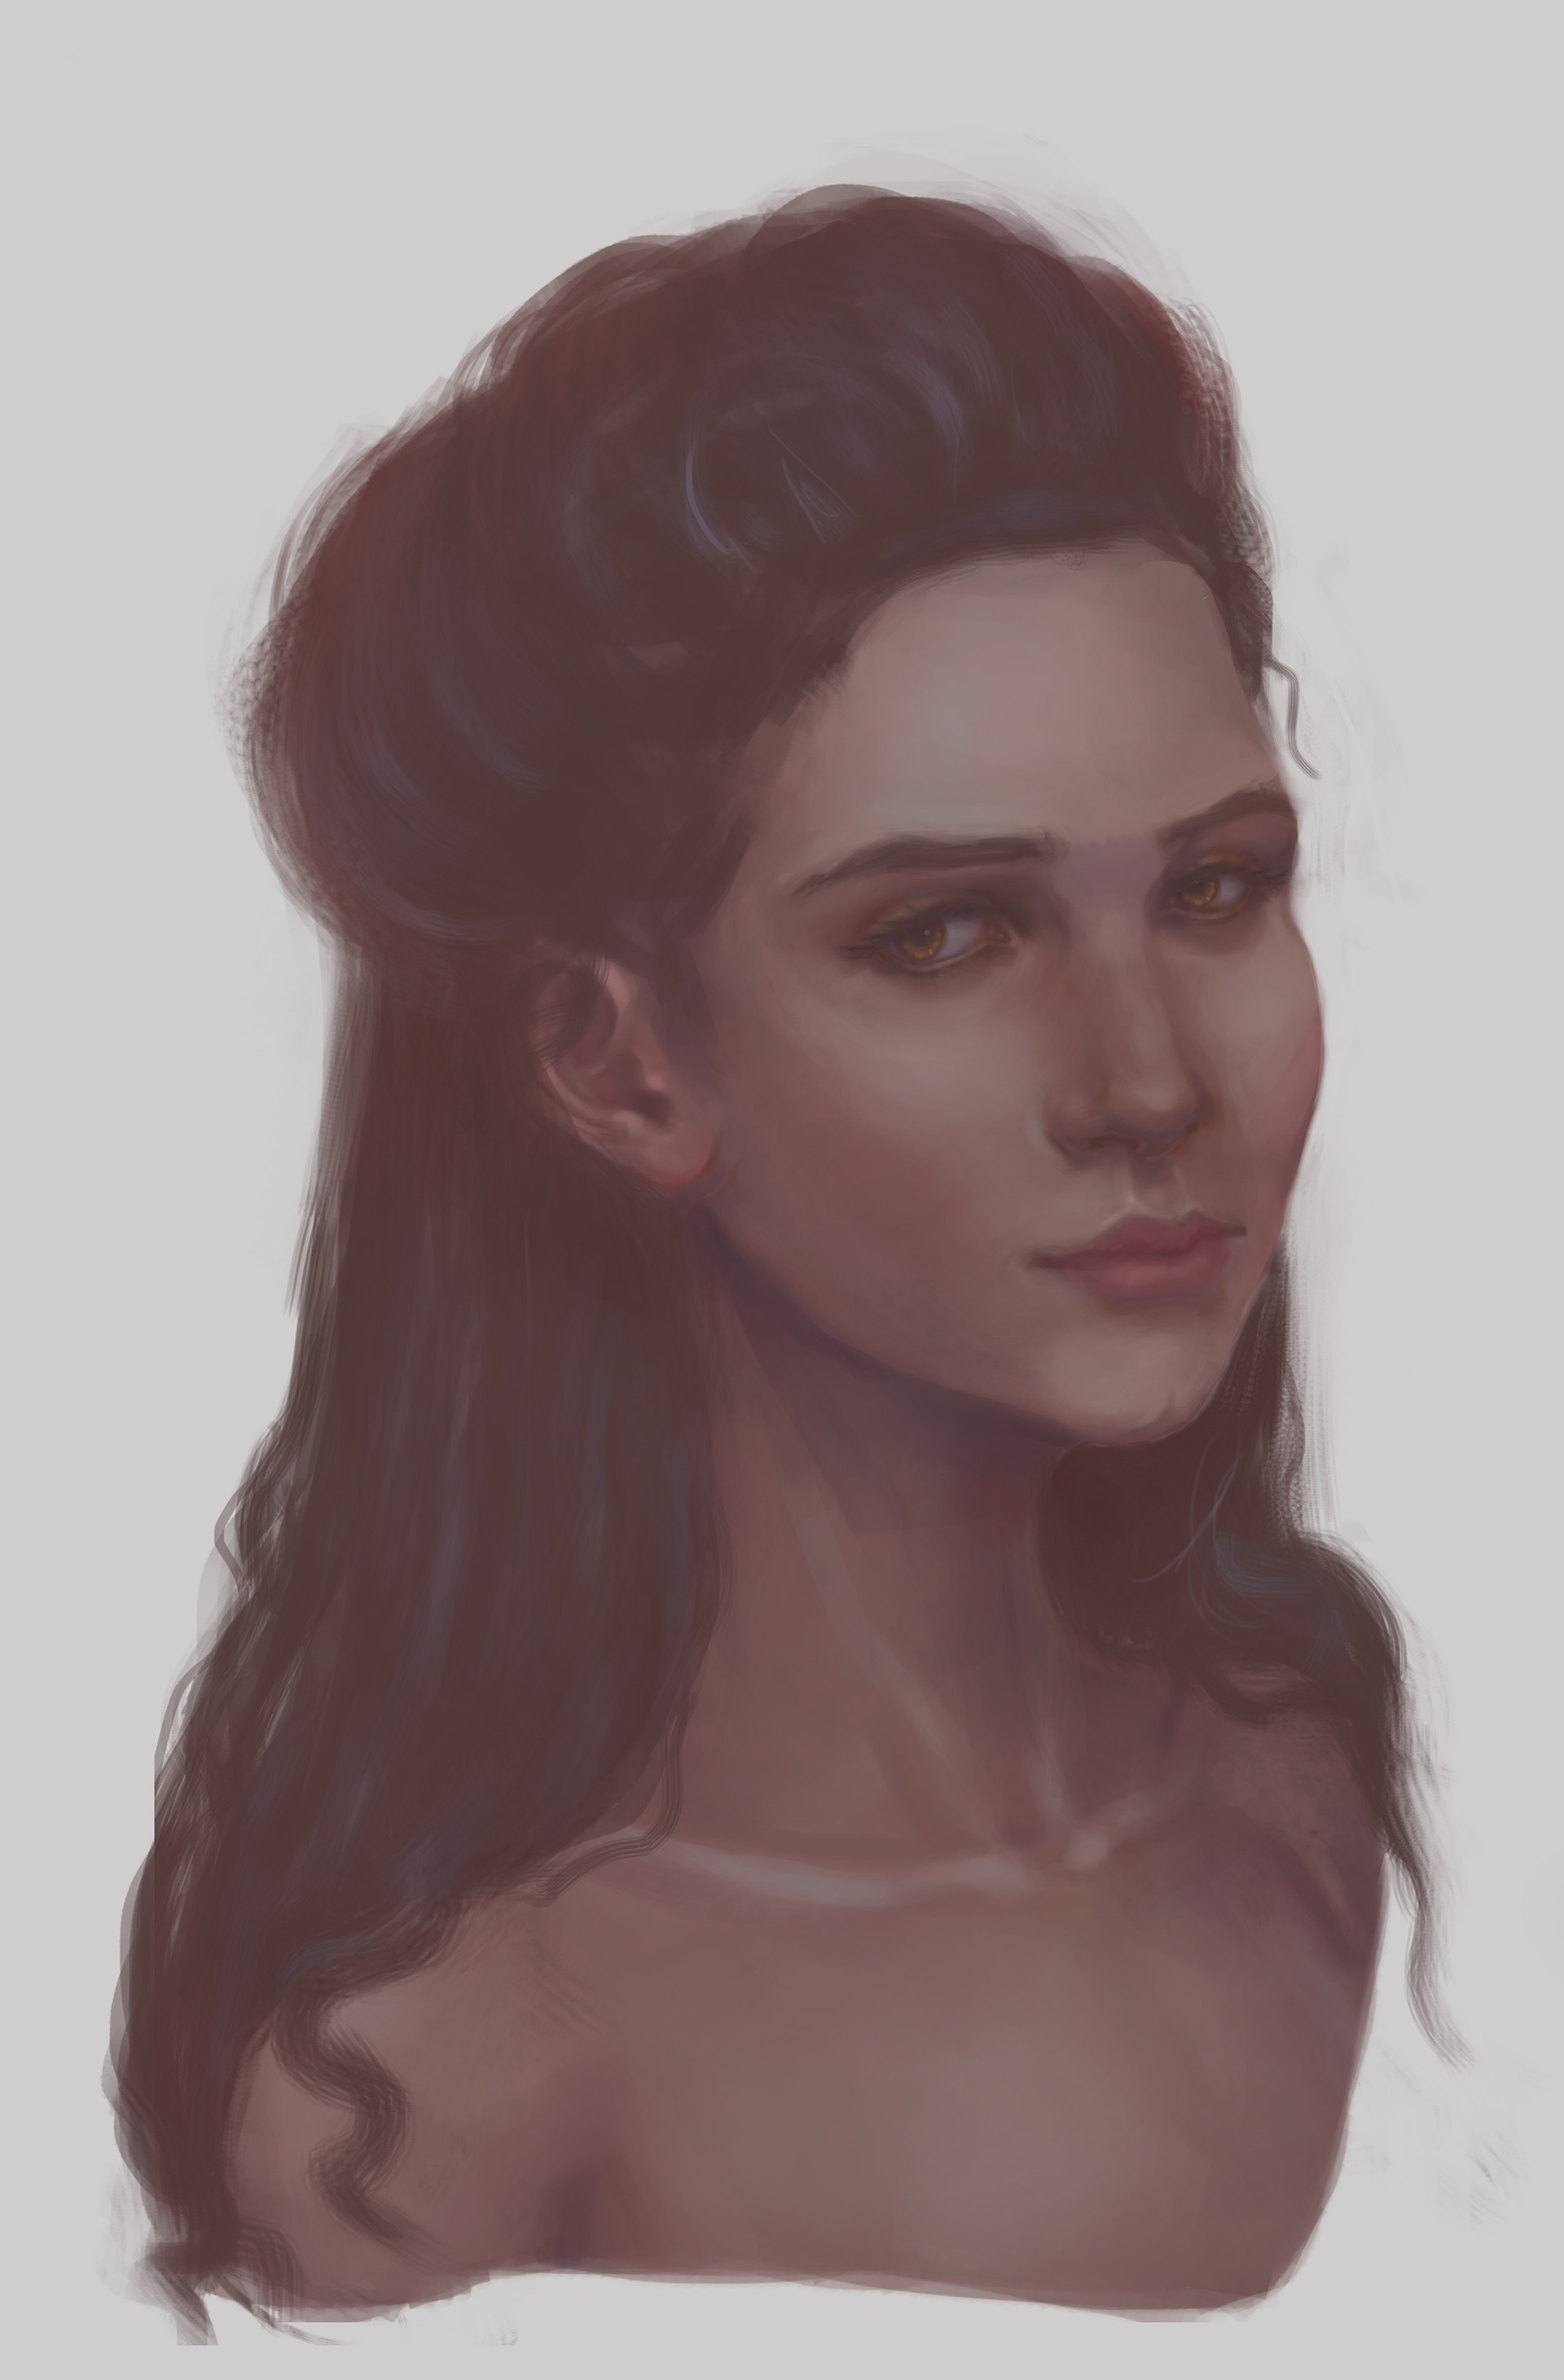 Maya grishanowitch marya 1